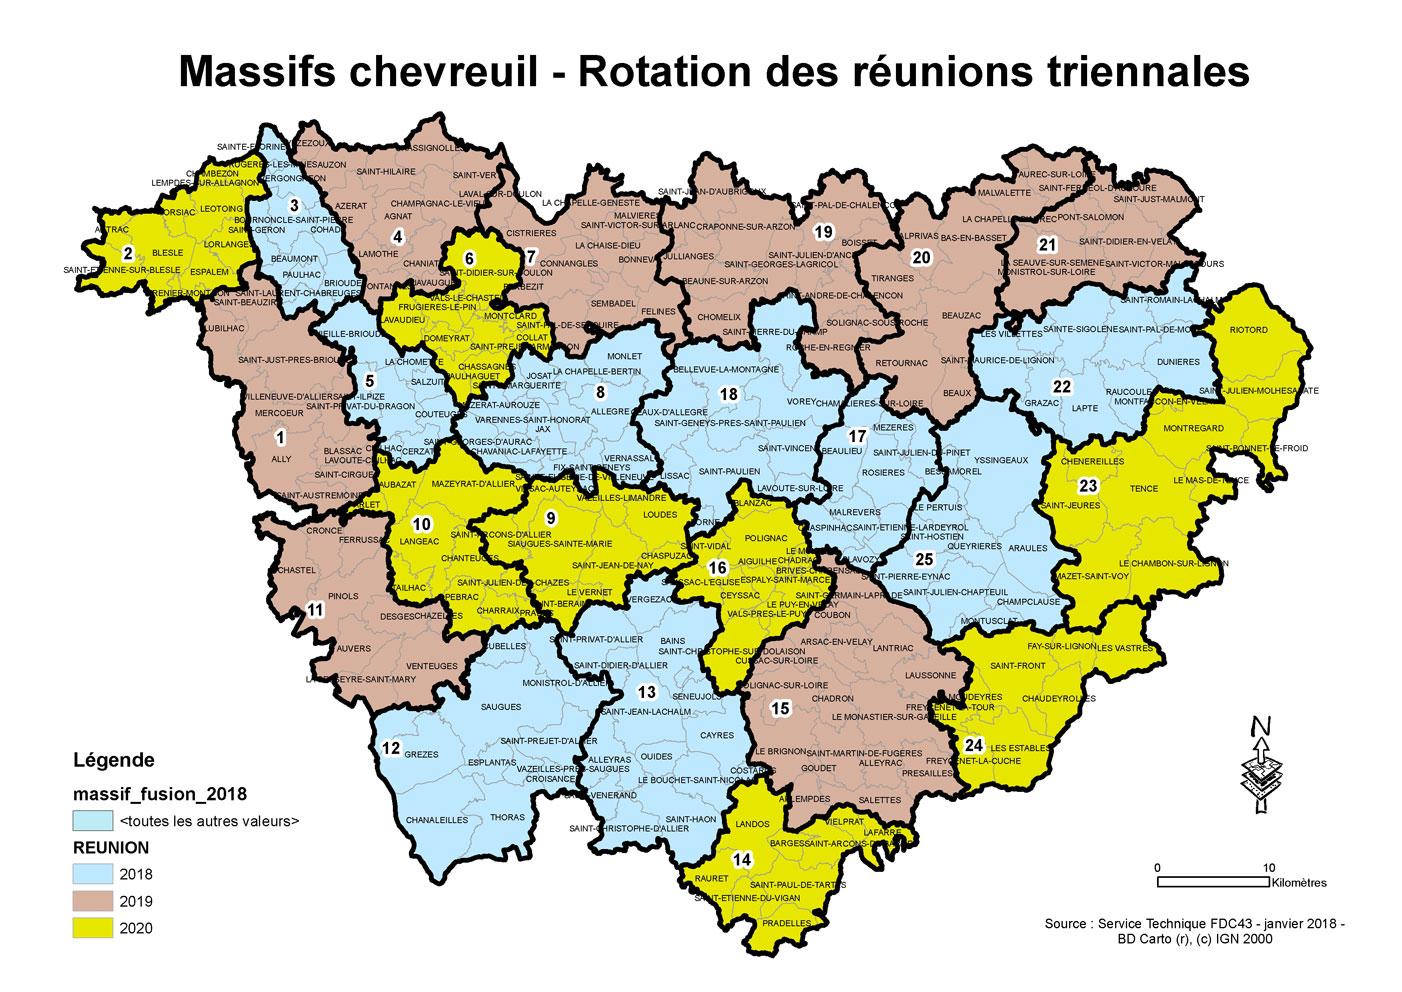 Rotation-reunions-triennales-chevreuil